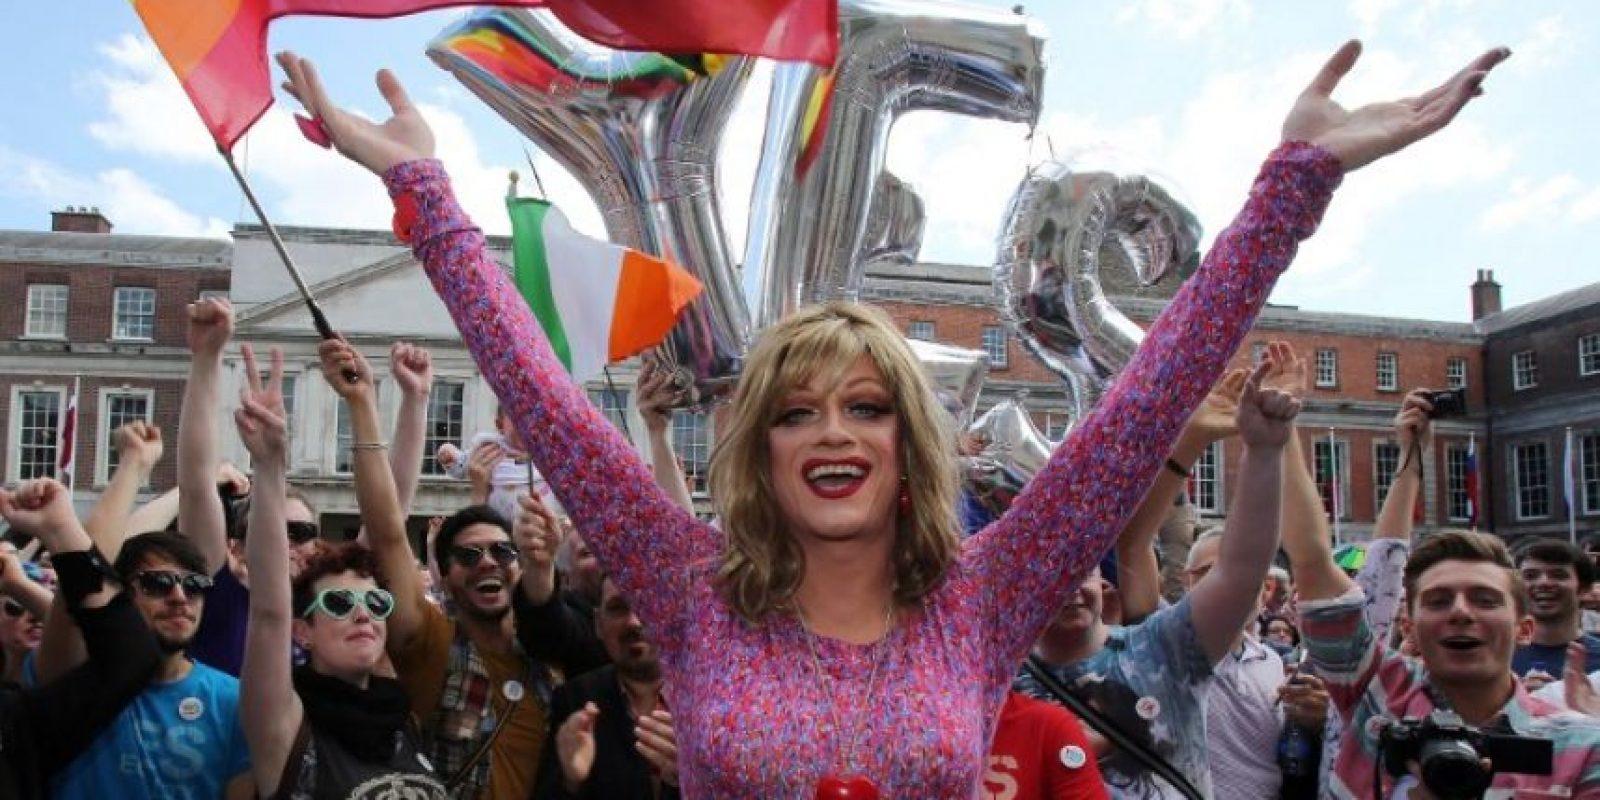 3. Irlanda aprueba los matrimonios entre parejas del mismo sexo por referéndum Foto:AFP